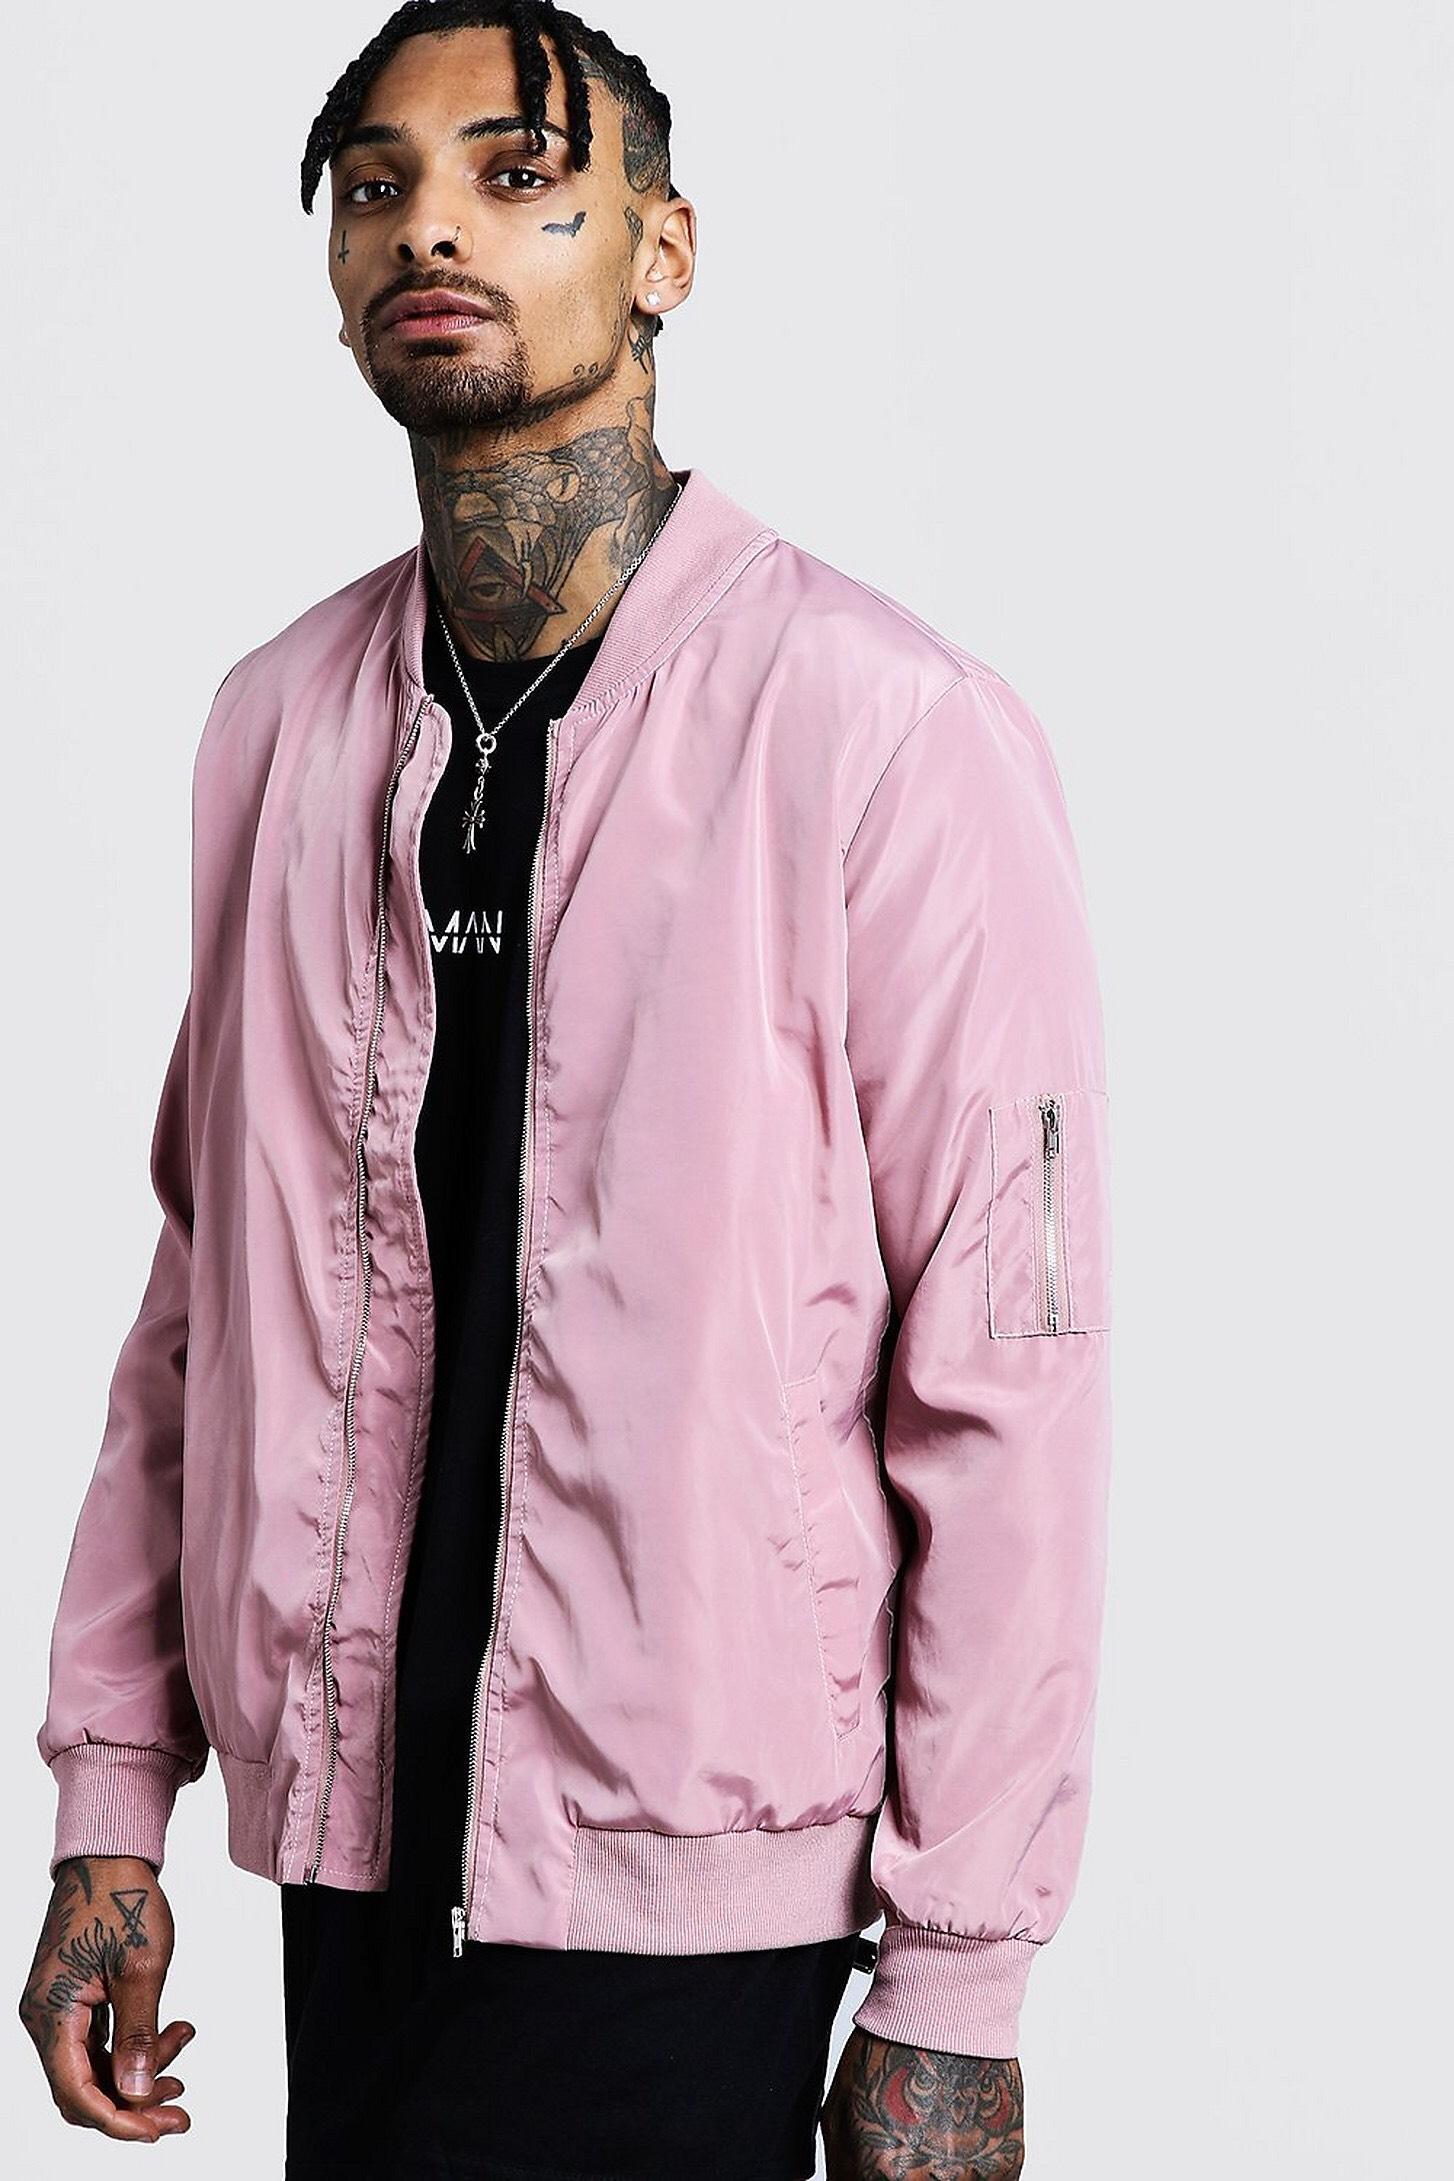 Men's Powder Pink MA1 Bomber Jacket. 25% off @ Boohooman - £15 (+£3.99 P&P)